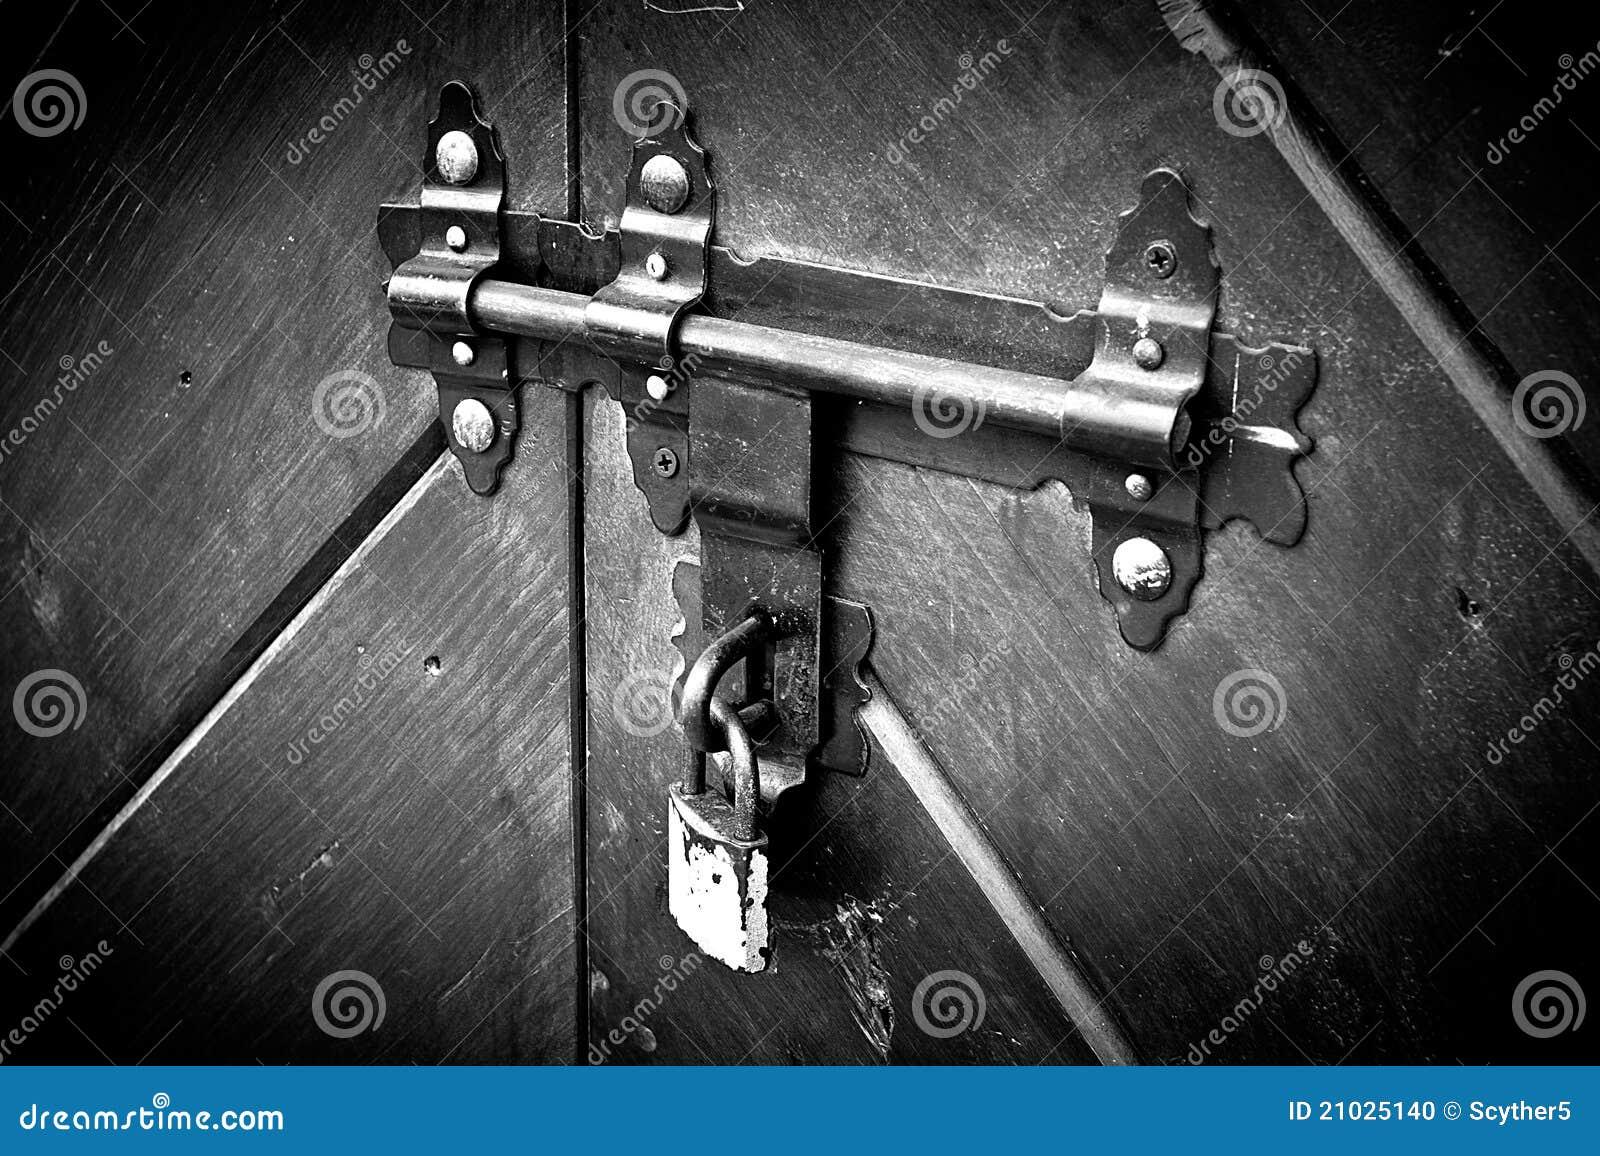 Verschlossene tür  Verschlossene Tür. Alte Verriegelung. Stockfoto - Bild: 21025140